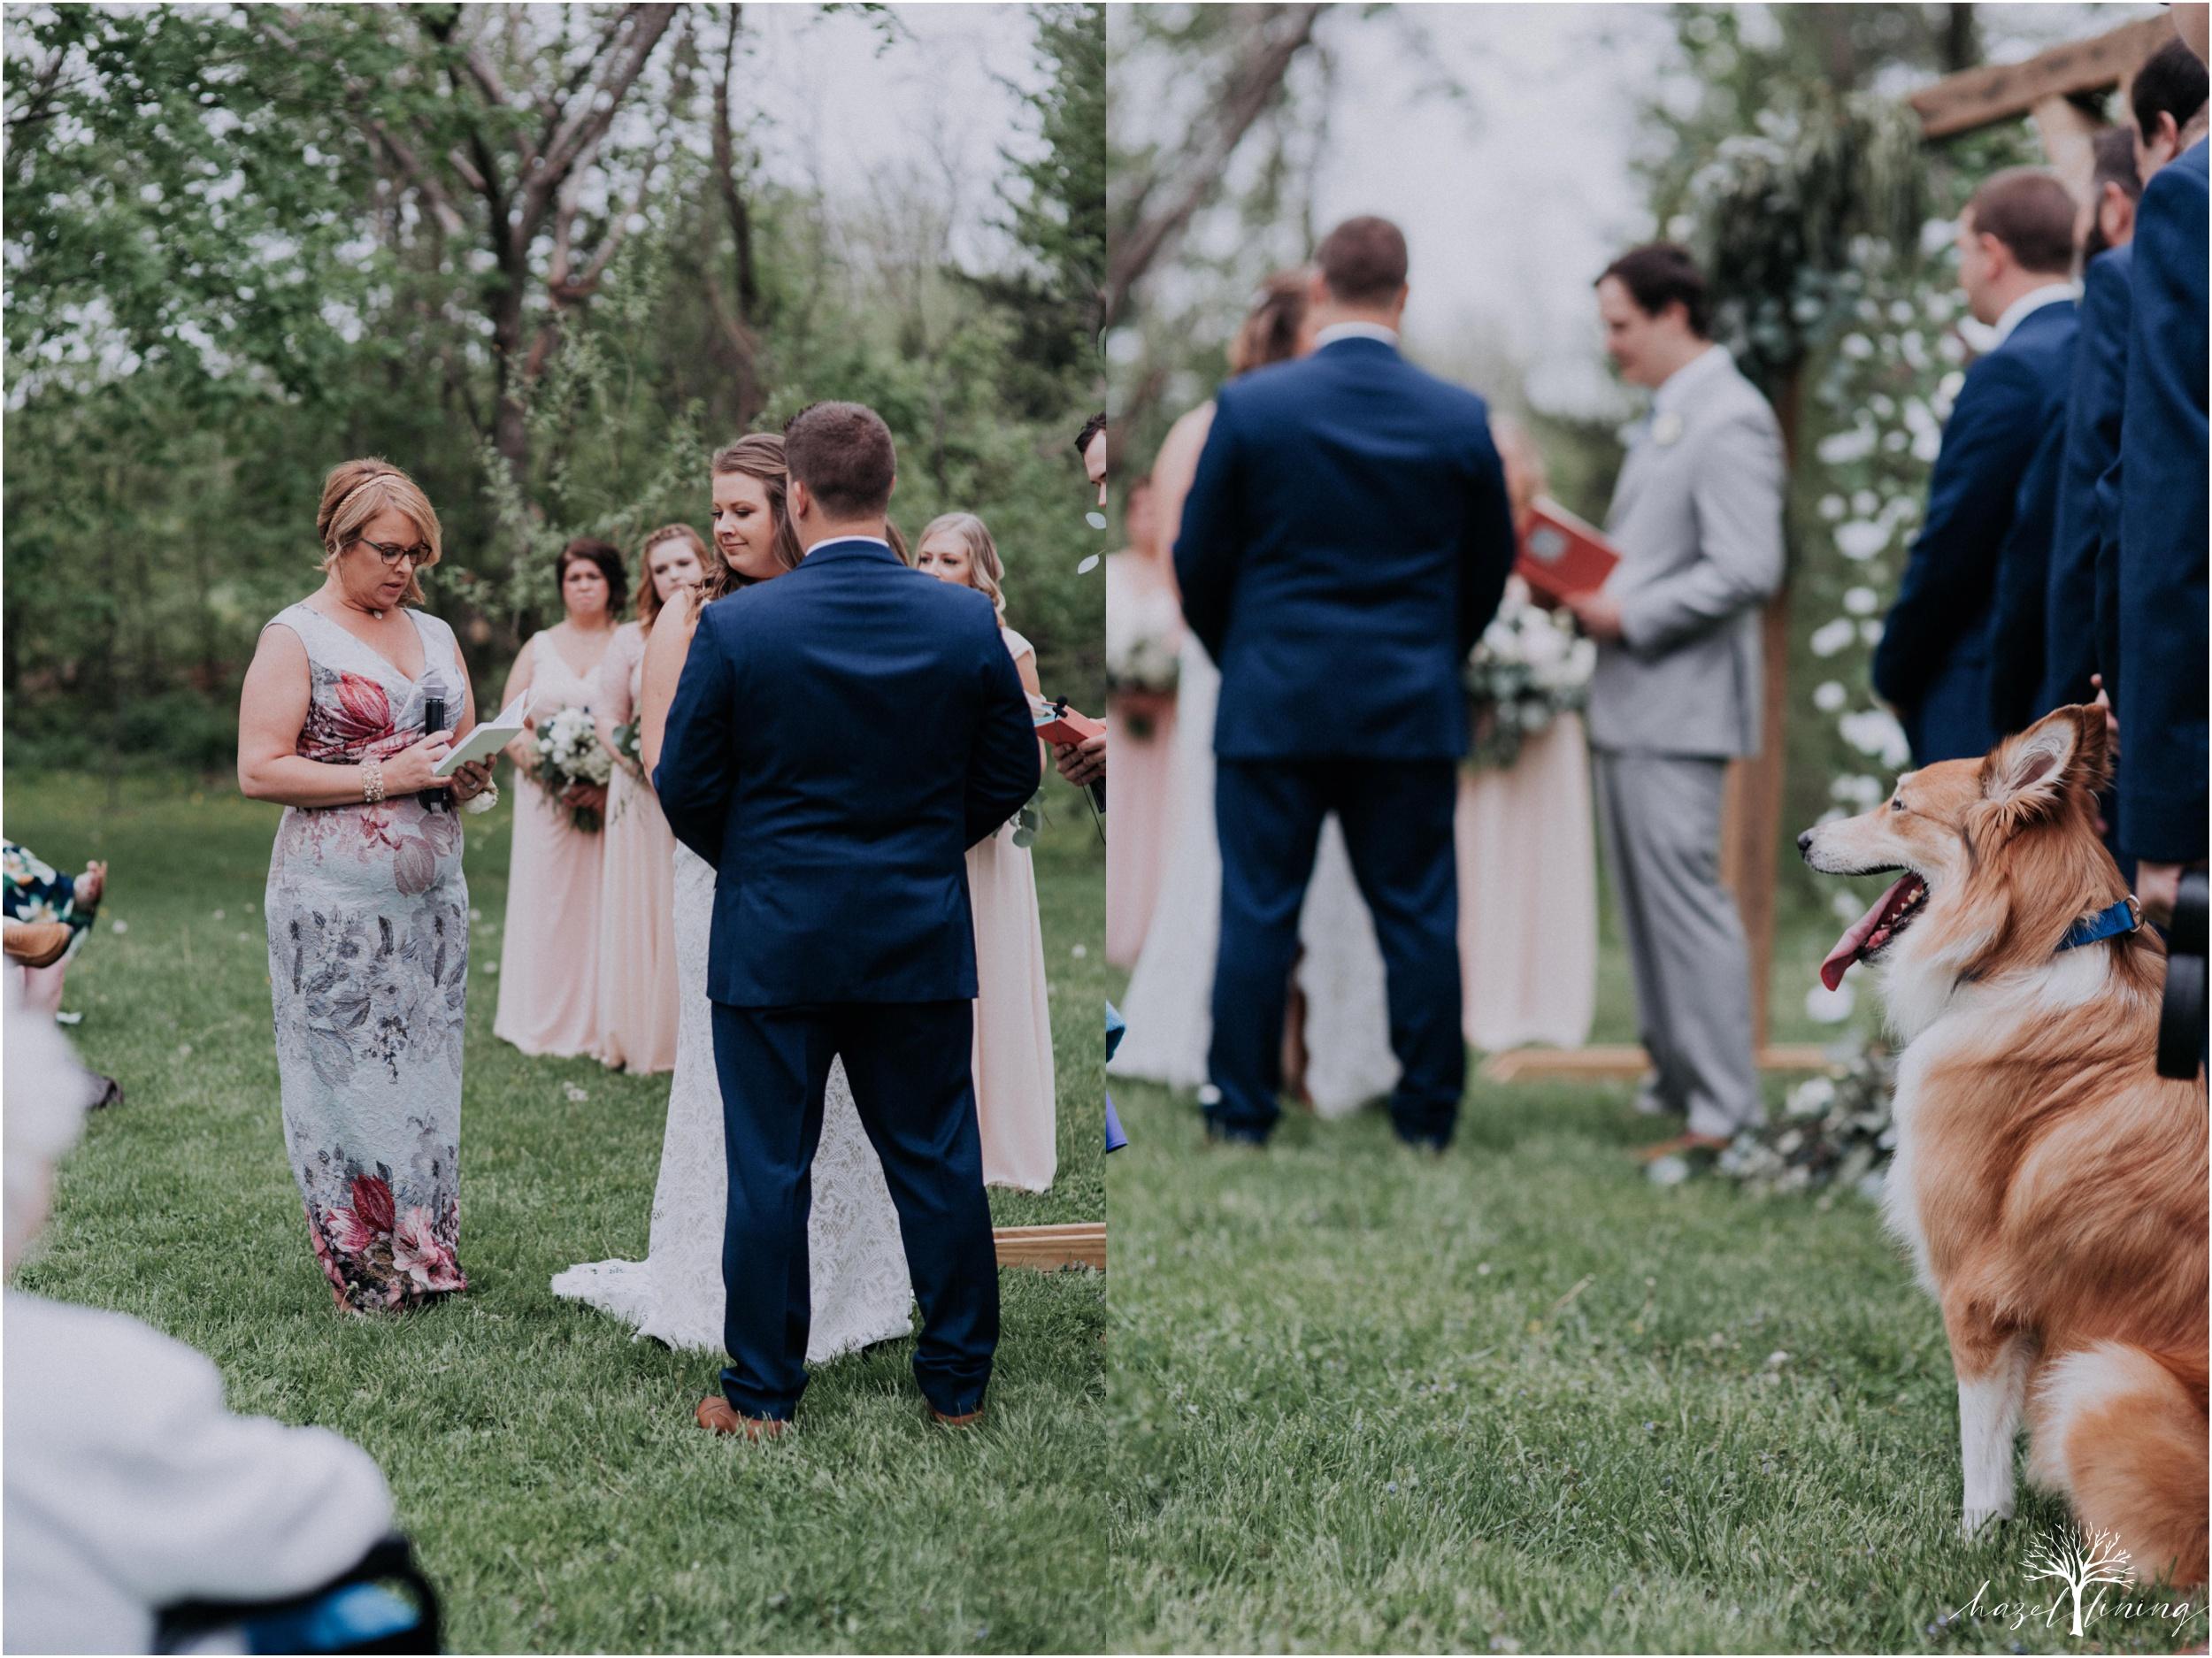 hazel-lining-travel-wedding-elopement-photography-abby-skyler-hunt-the-willis-house-york-pennsylvania-outdoor-estate-wedding_0089.jpg